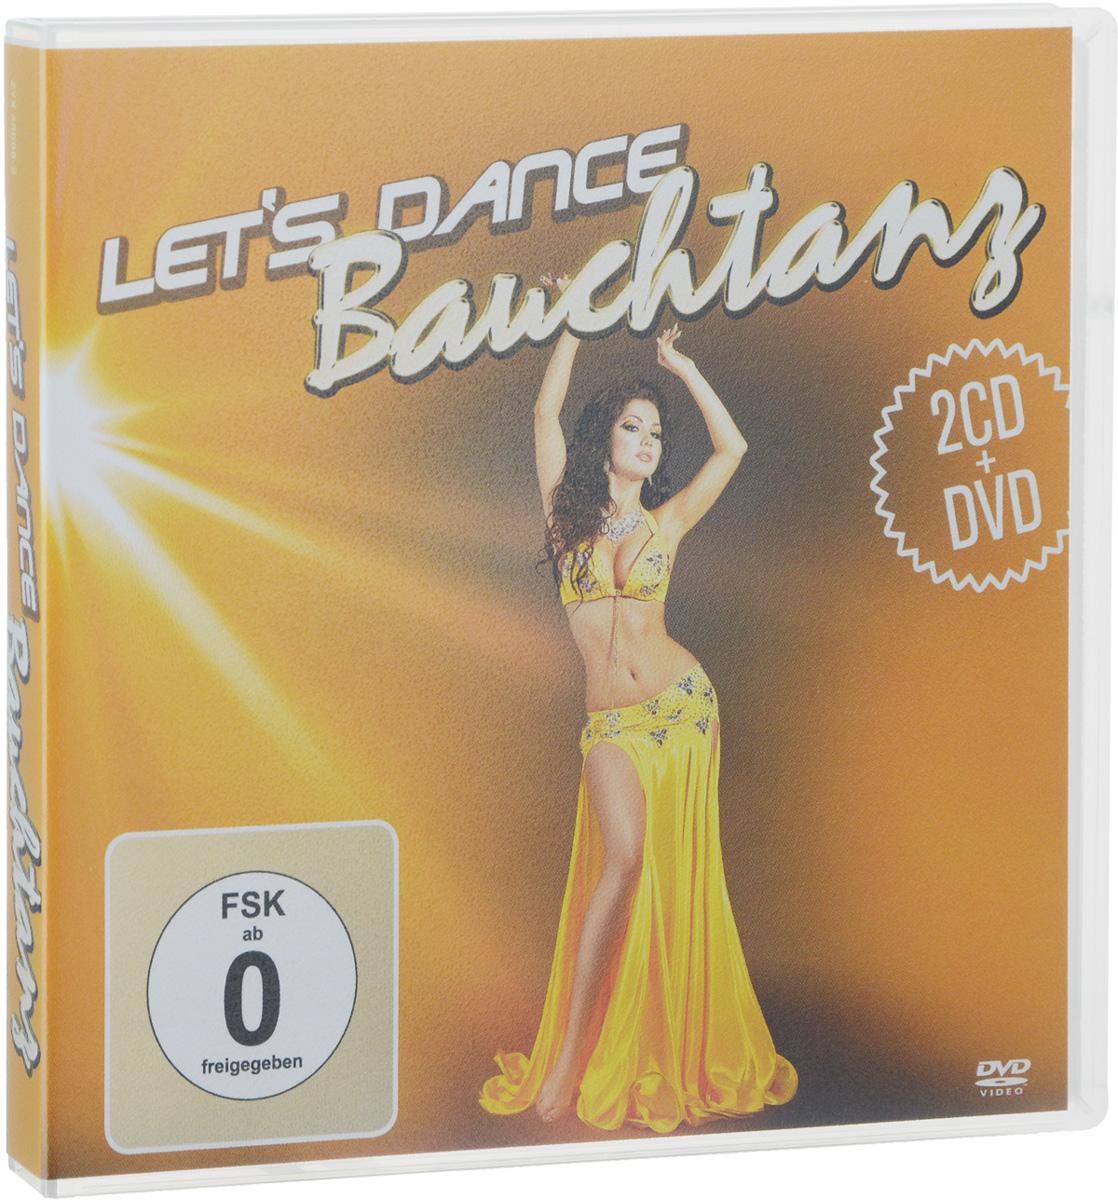 The Sout El Hob Band Let's Dance. Bauchtanz (2 CD + DVD) блокада 2 dvd